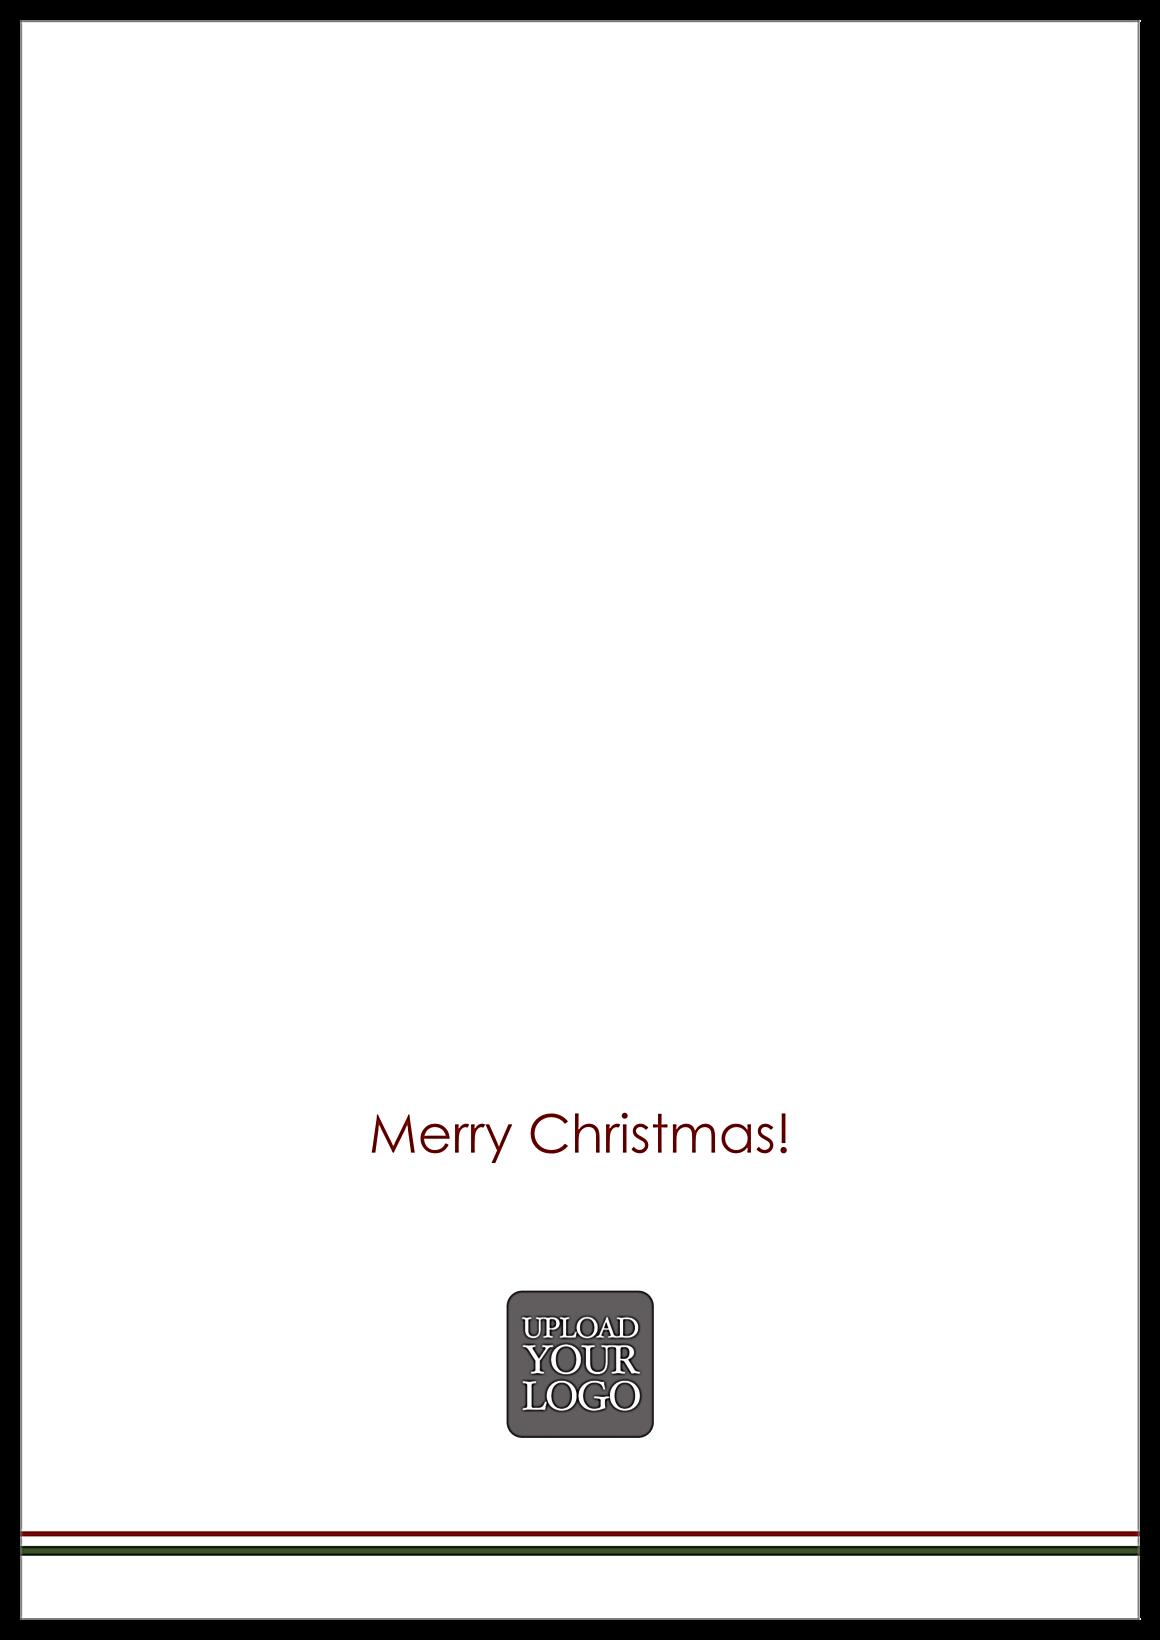 Swirl Reindeer back - Greeting Cards Maker